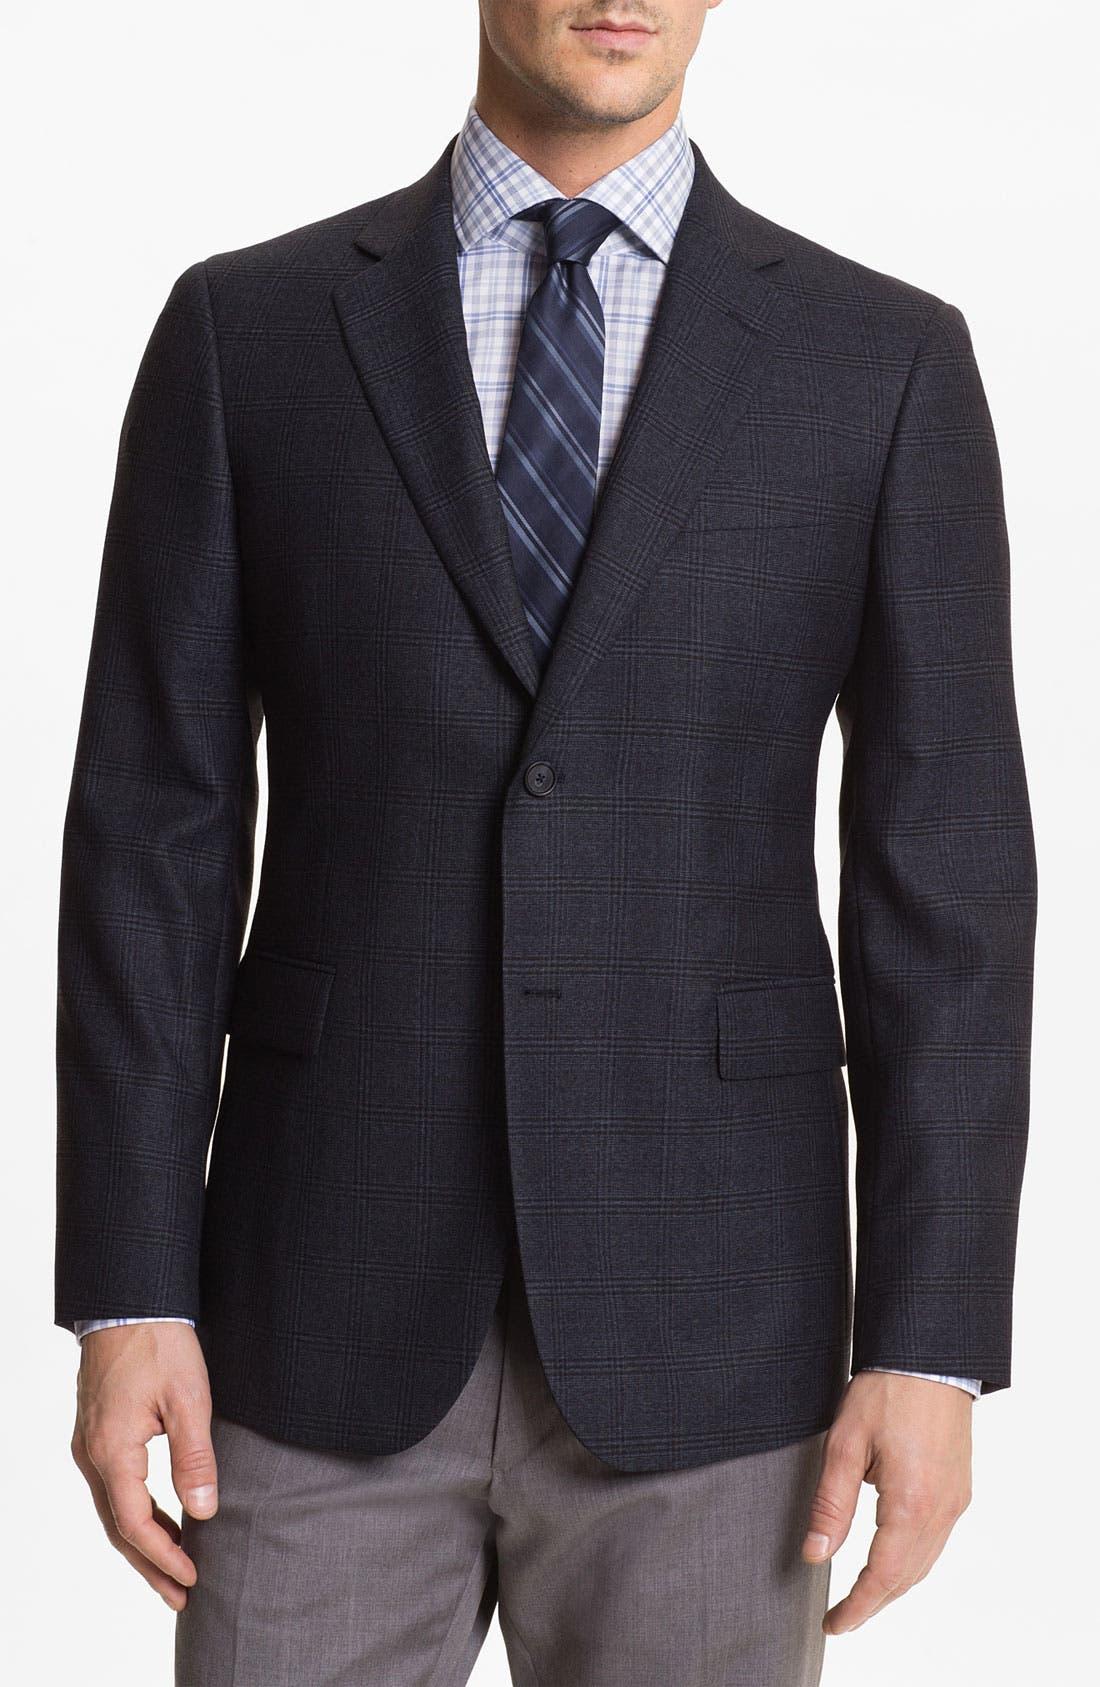 Alternate Image 1 Selected - John W. Nordstrom® Plaid Wool Sportcoat